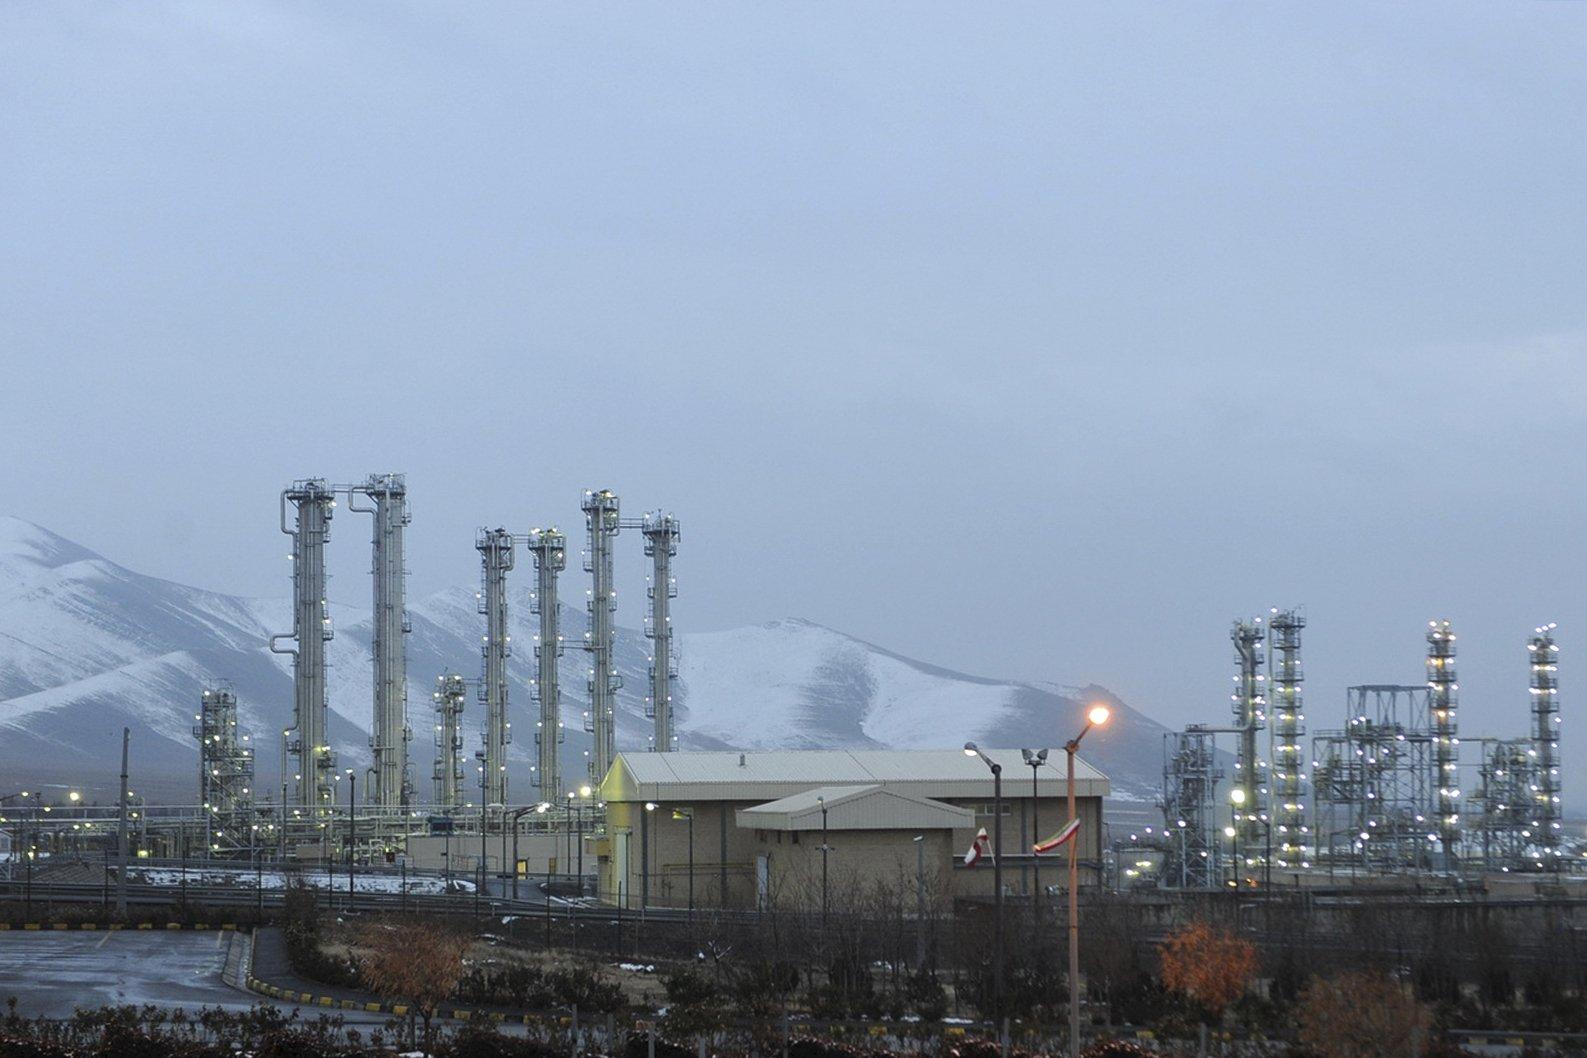 Lights speckle the Arak heavy-water nuclear facilities, near the central city of Arak, 150 miles (250 kilometers) southwest of the capital Tehran, Iran, Jan. 15, 2011. (AP Photo/ISNA, Hamid Foroutan, File)